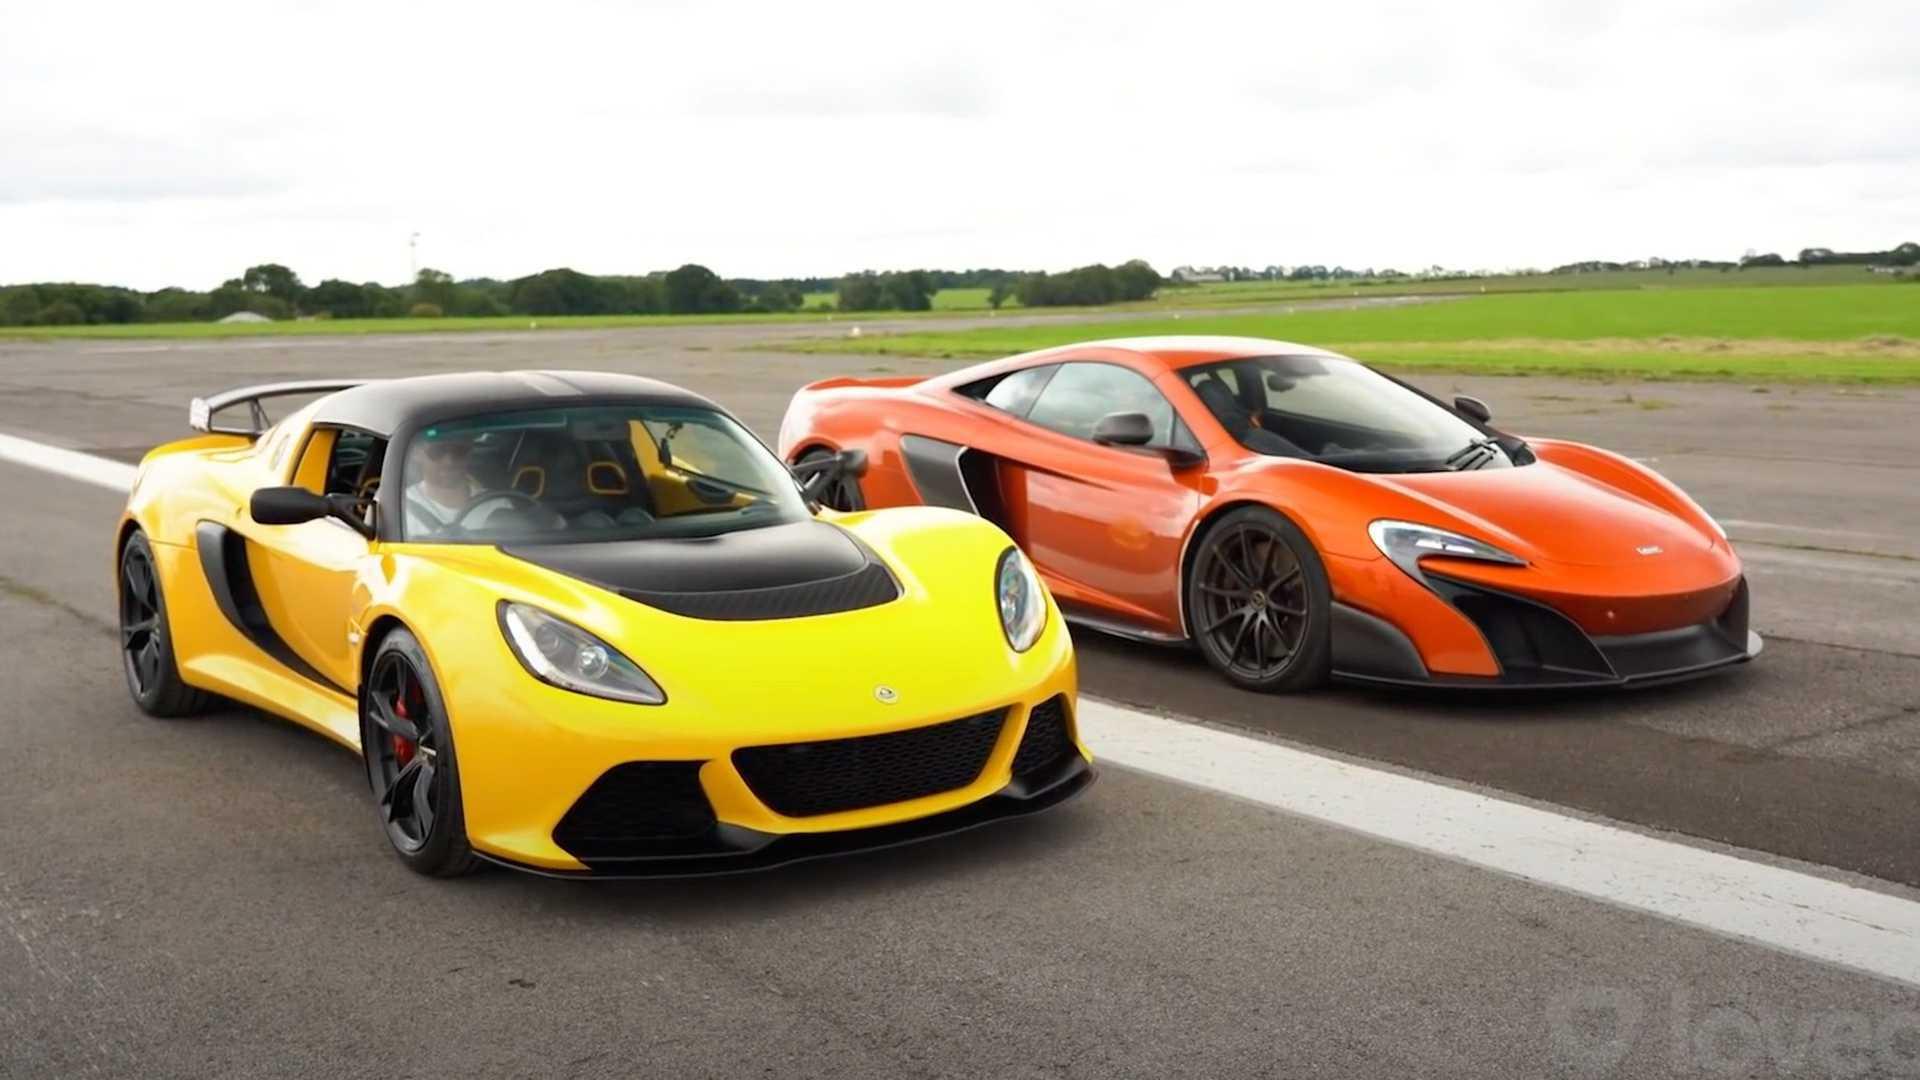 McLaren 675LT vs Lotus Exige V6 Club Racer Drag Race